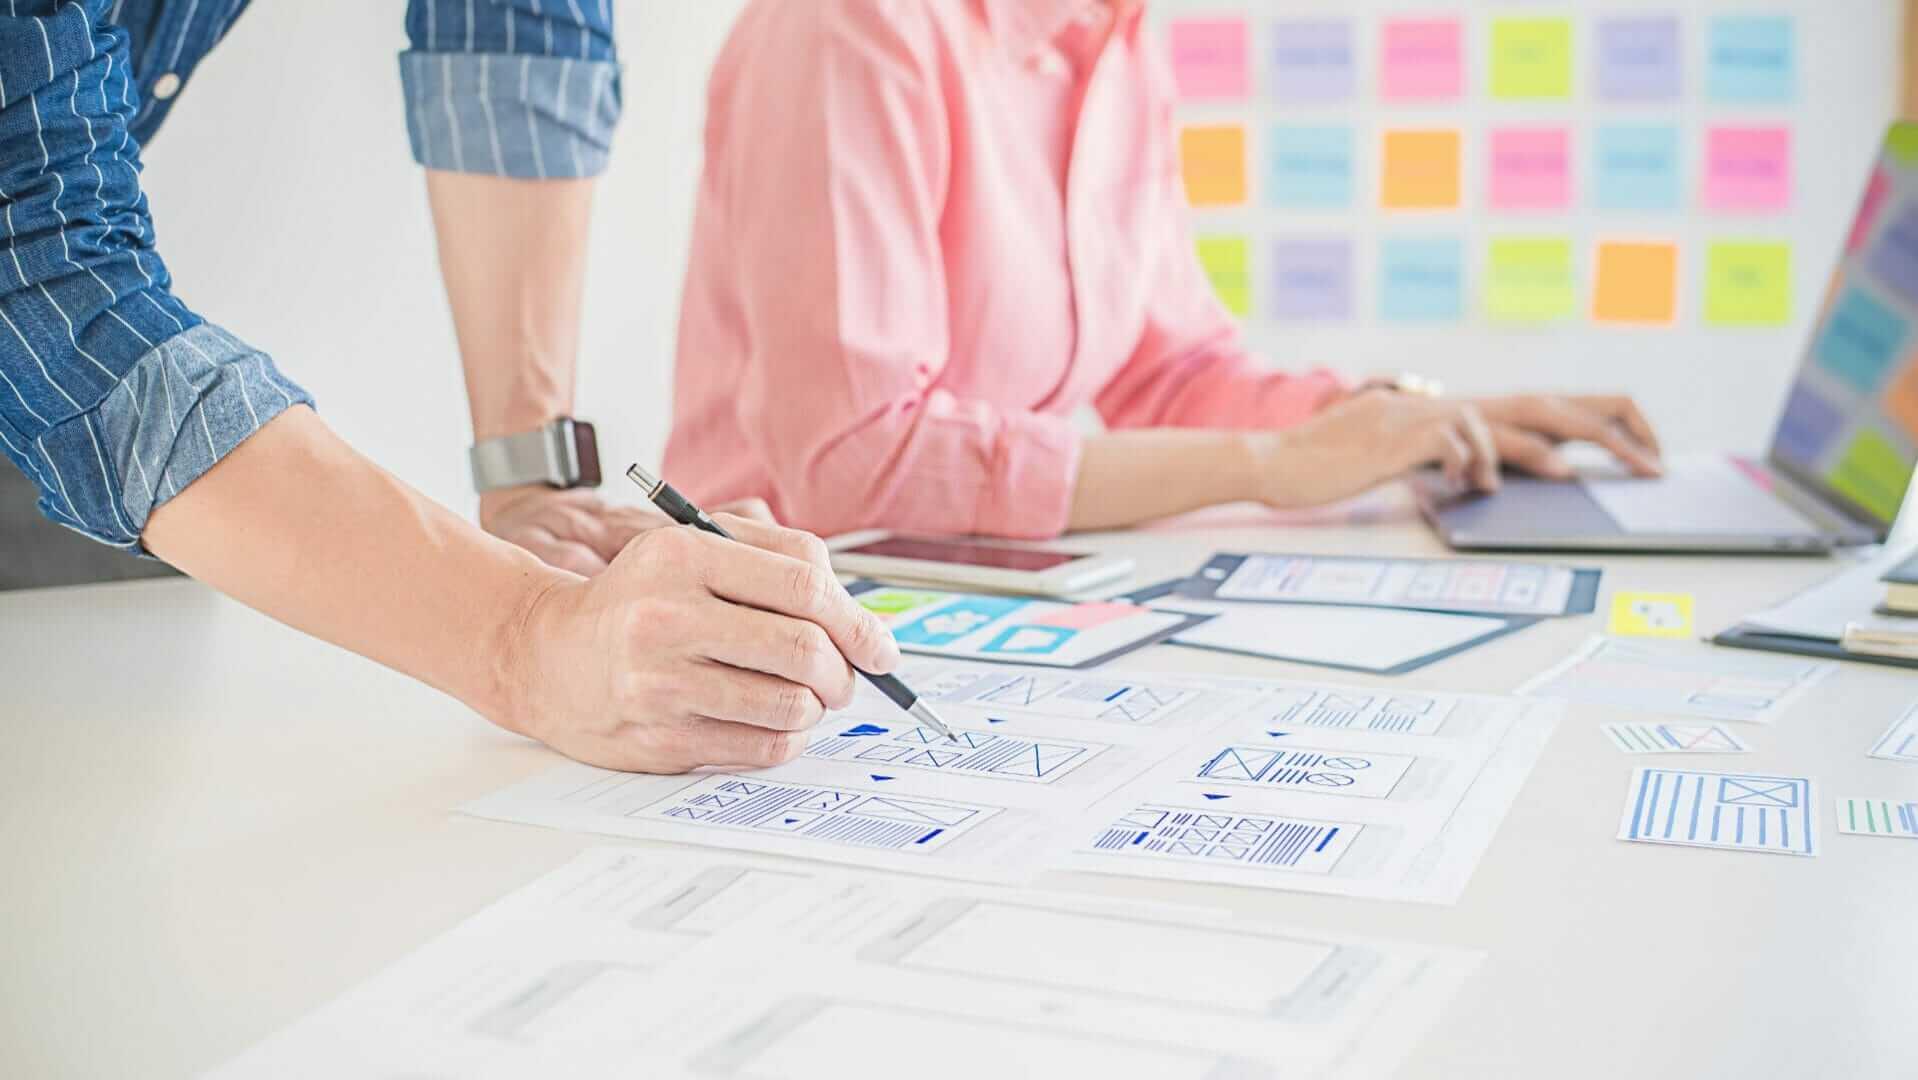 creative-web-designer-planning-application-developing-template-layout-framework-mobile-phone